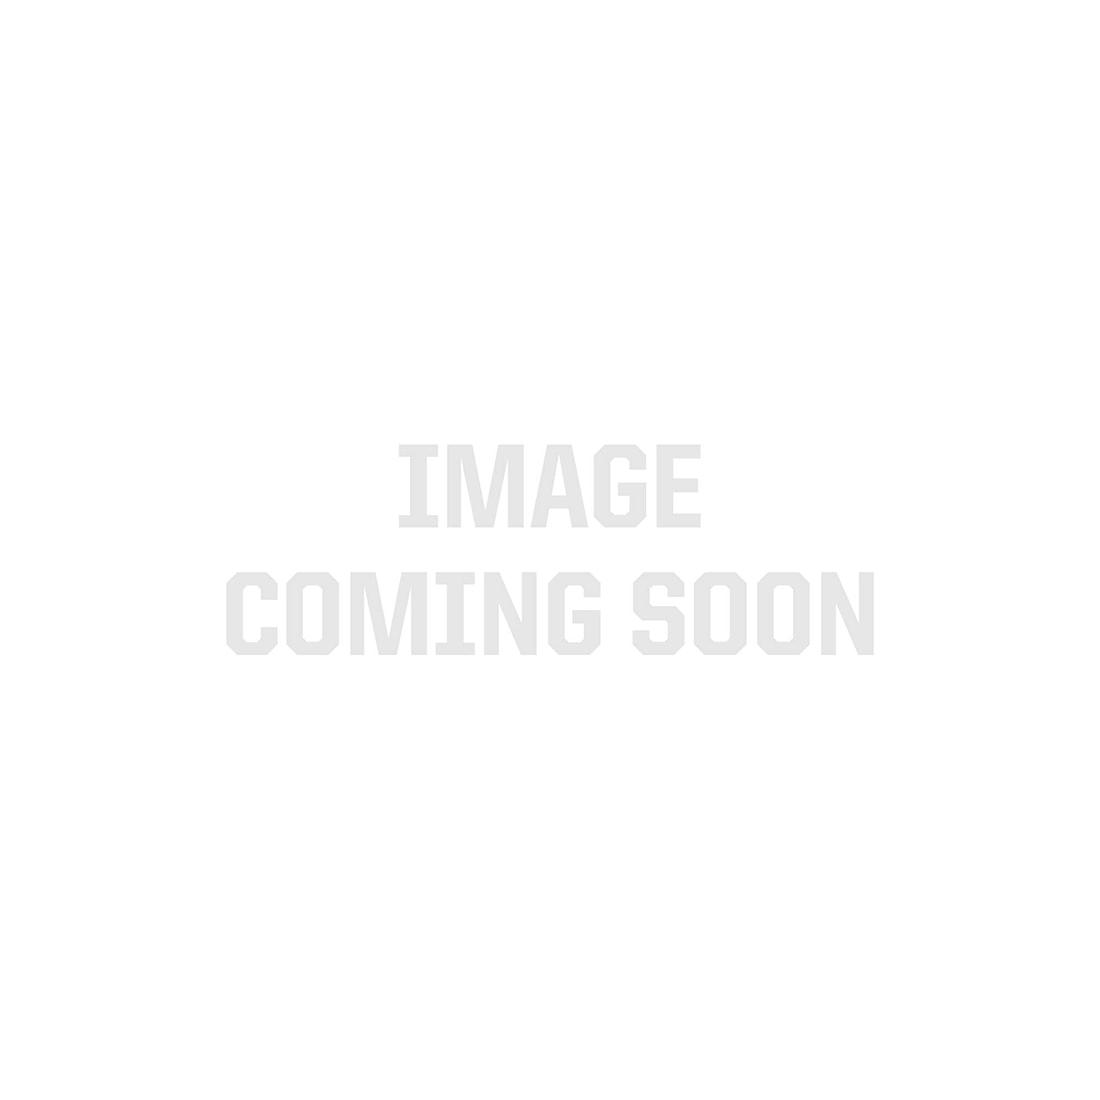 Green 2835 CurrentControl Bendable ZigZag LED Strip Light, 60/m, 8mm wide, Sample Kit